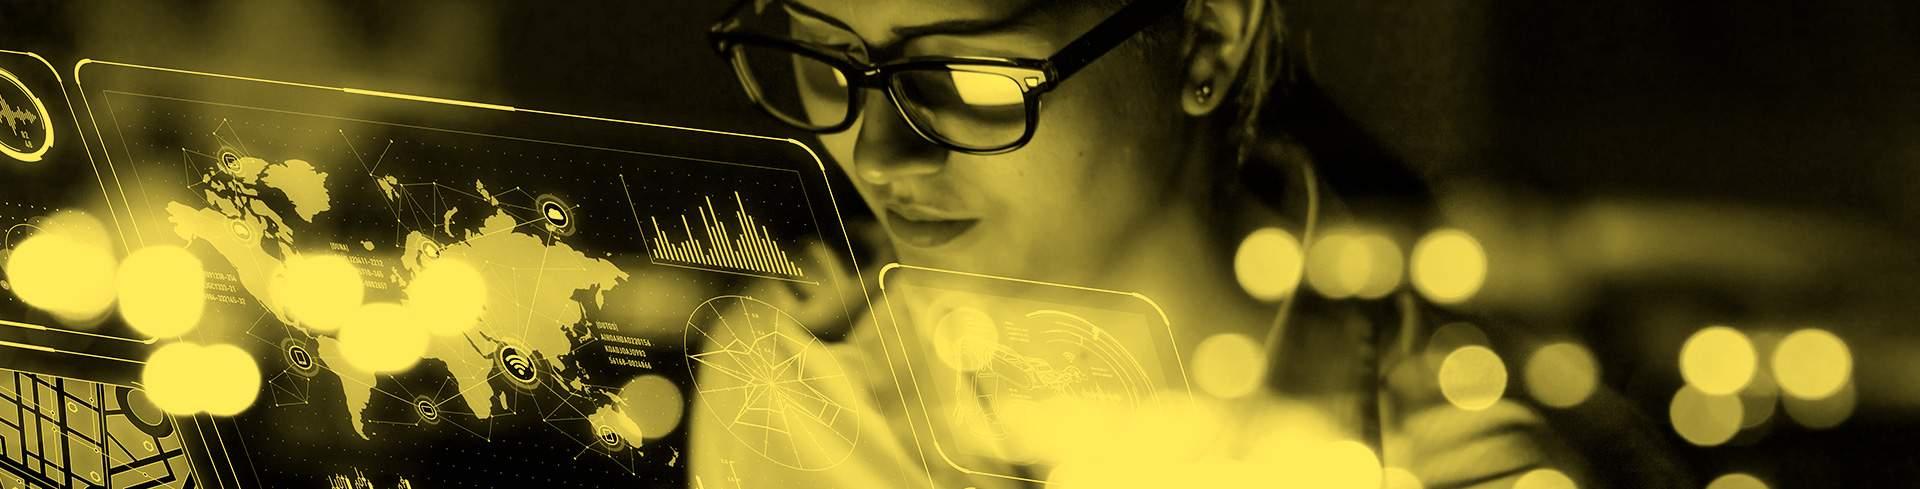 Machine Learning para Business intelligence